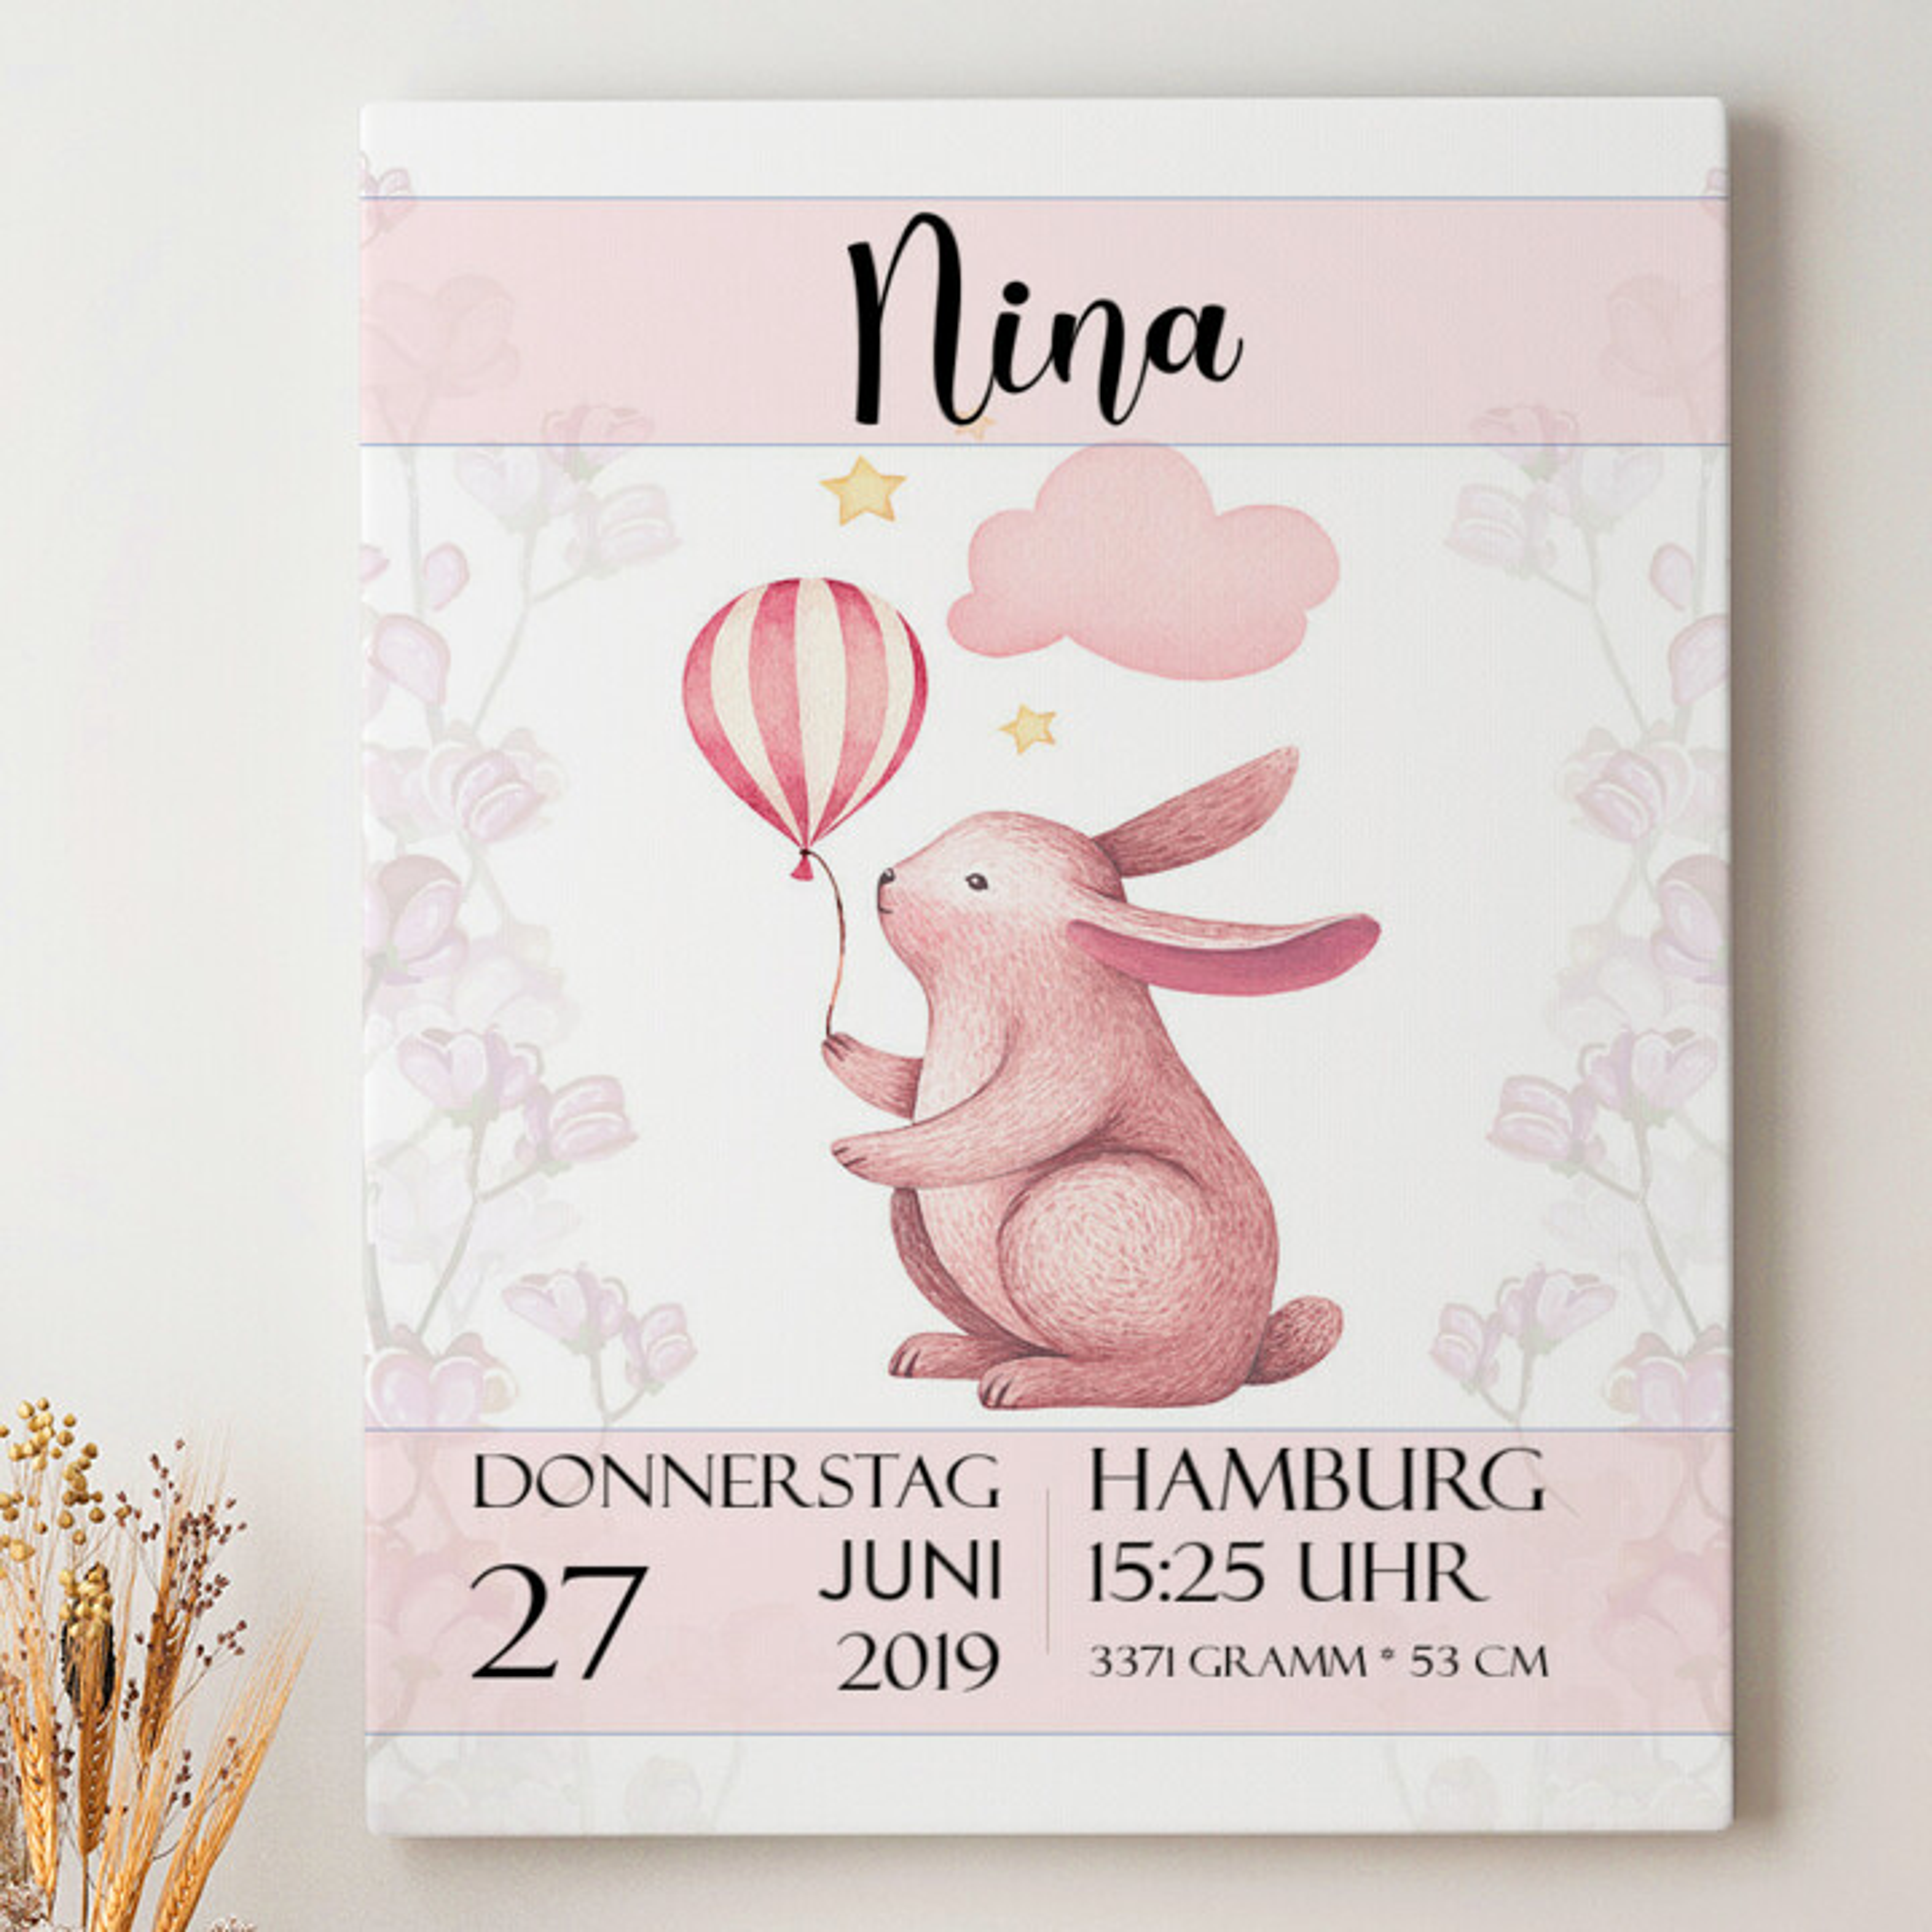 Leinwandbild personalisiert Leinwand zur Geburt Hase mit Ballon